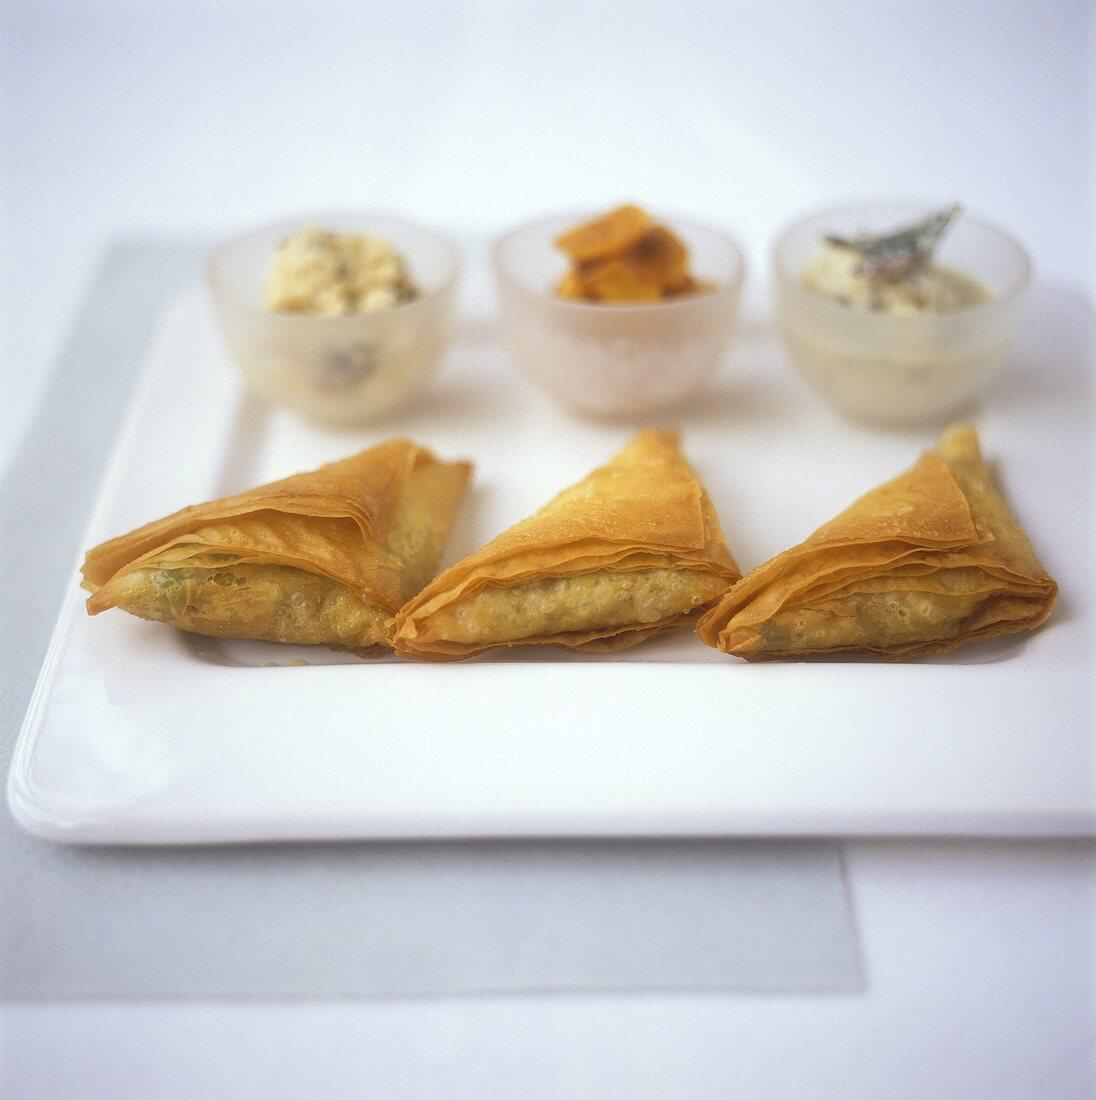 Samosas (vegetable pasties) and three sauces